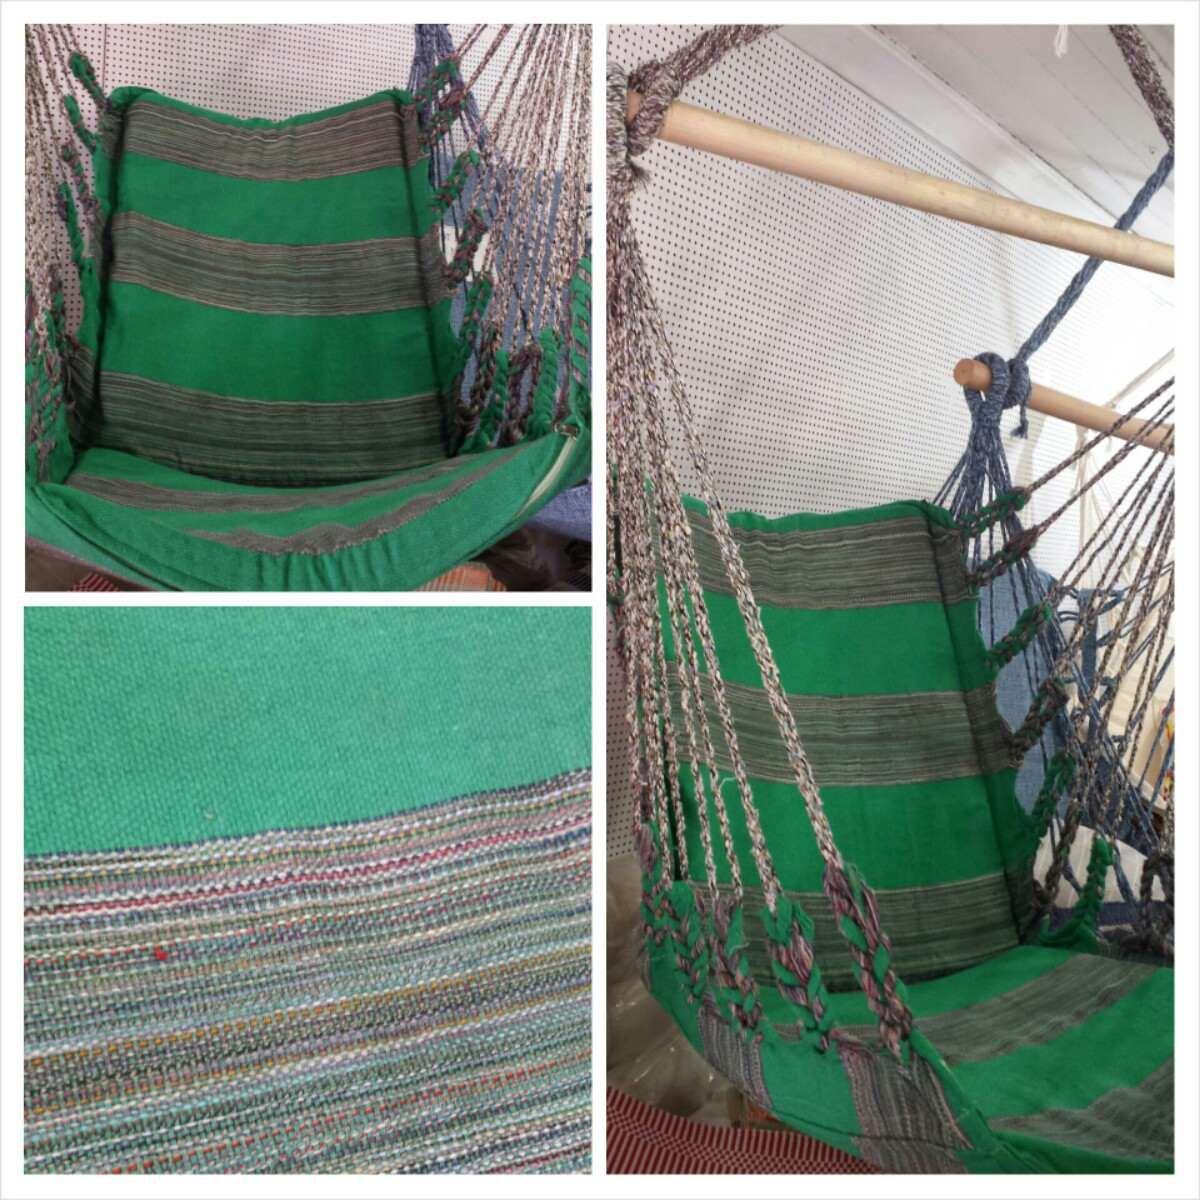 Rede Cadeira De Teto Descanso Balanço Artesanal Coloridas R$ 110 00  #256645 1200x1200